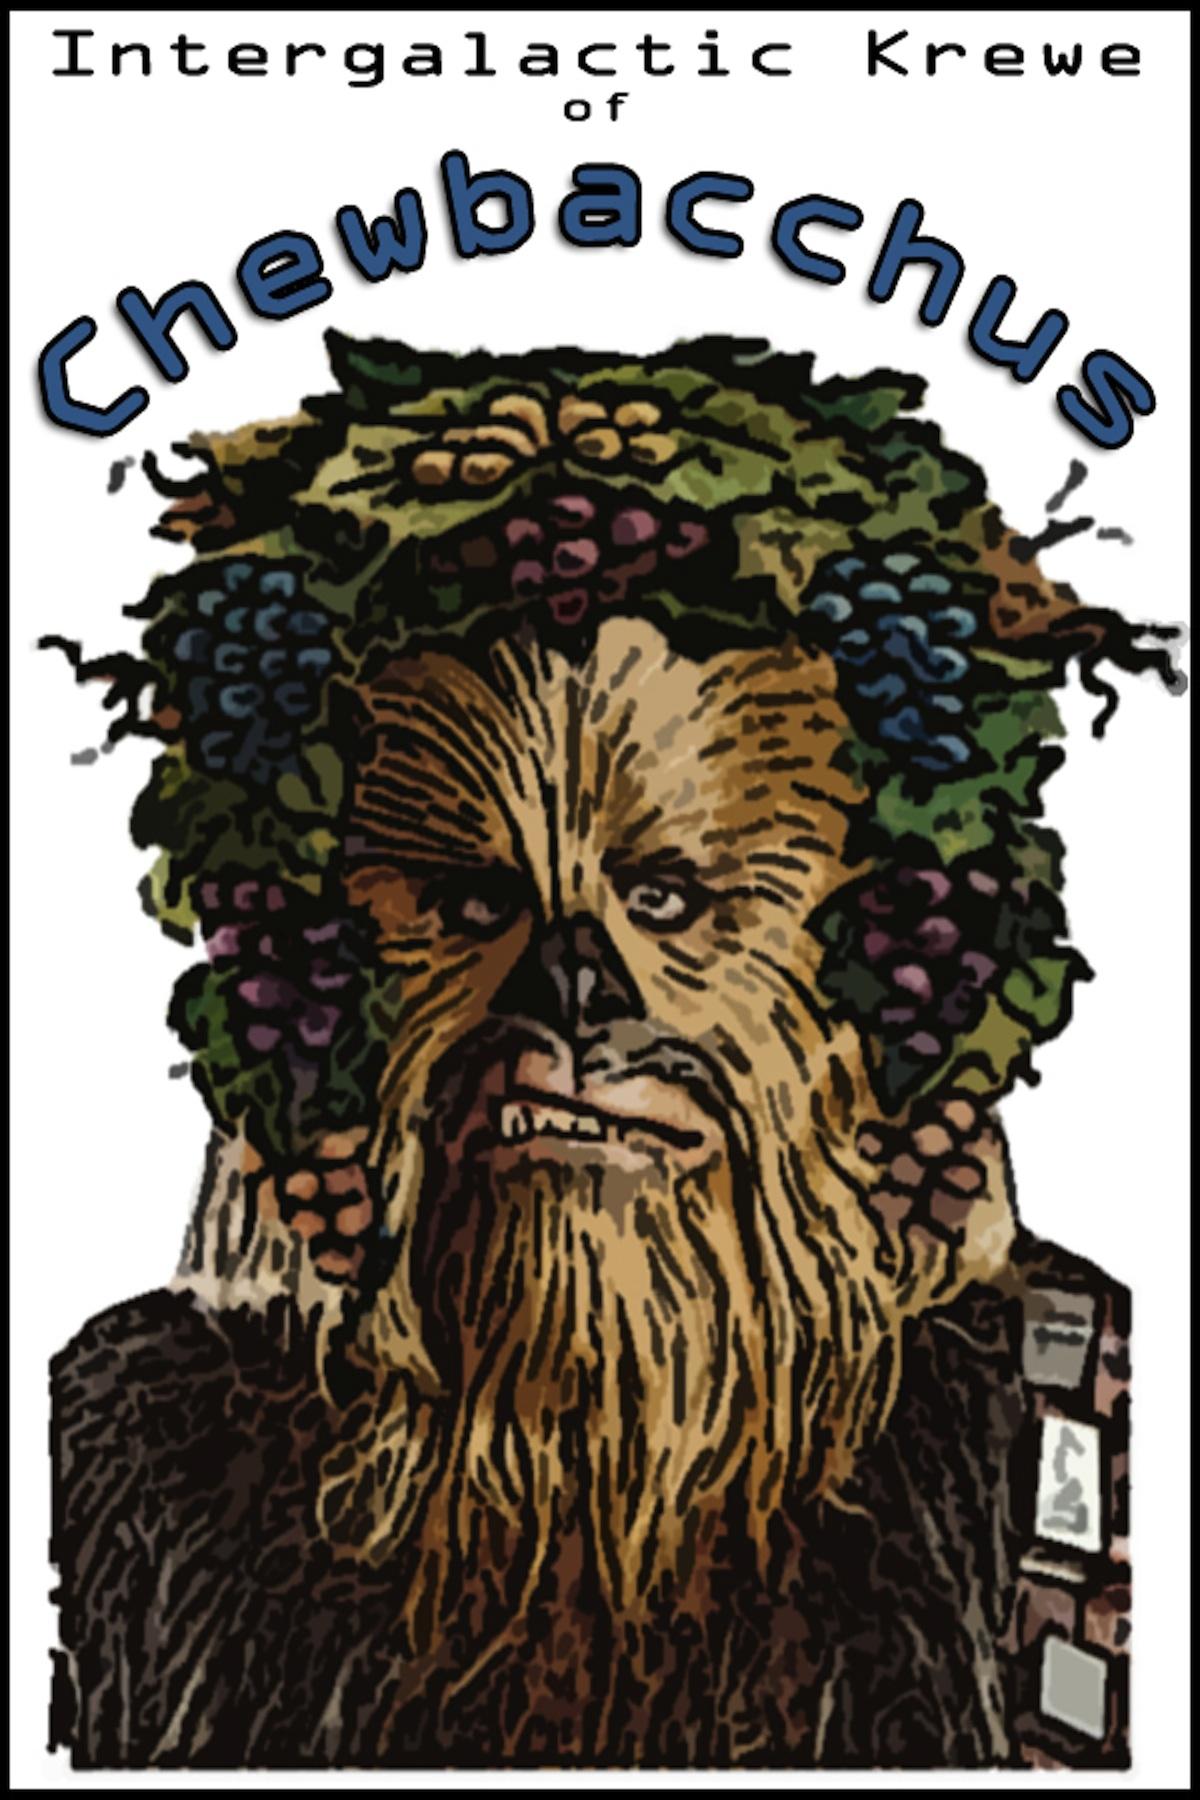 Chewbacchus Logo 2010